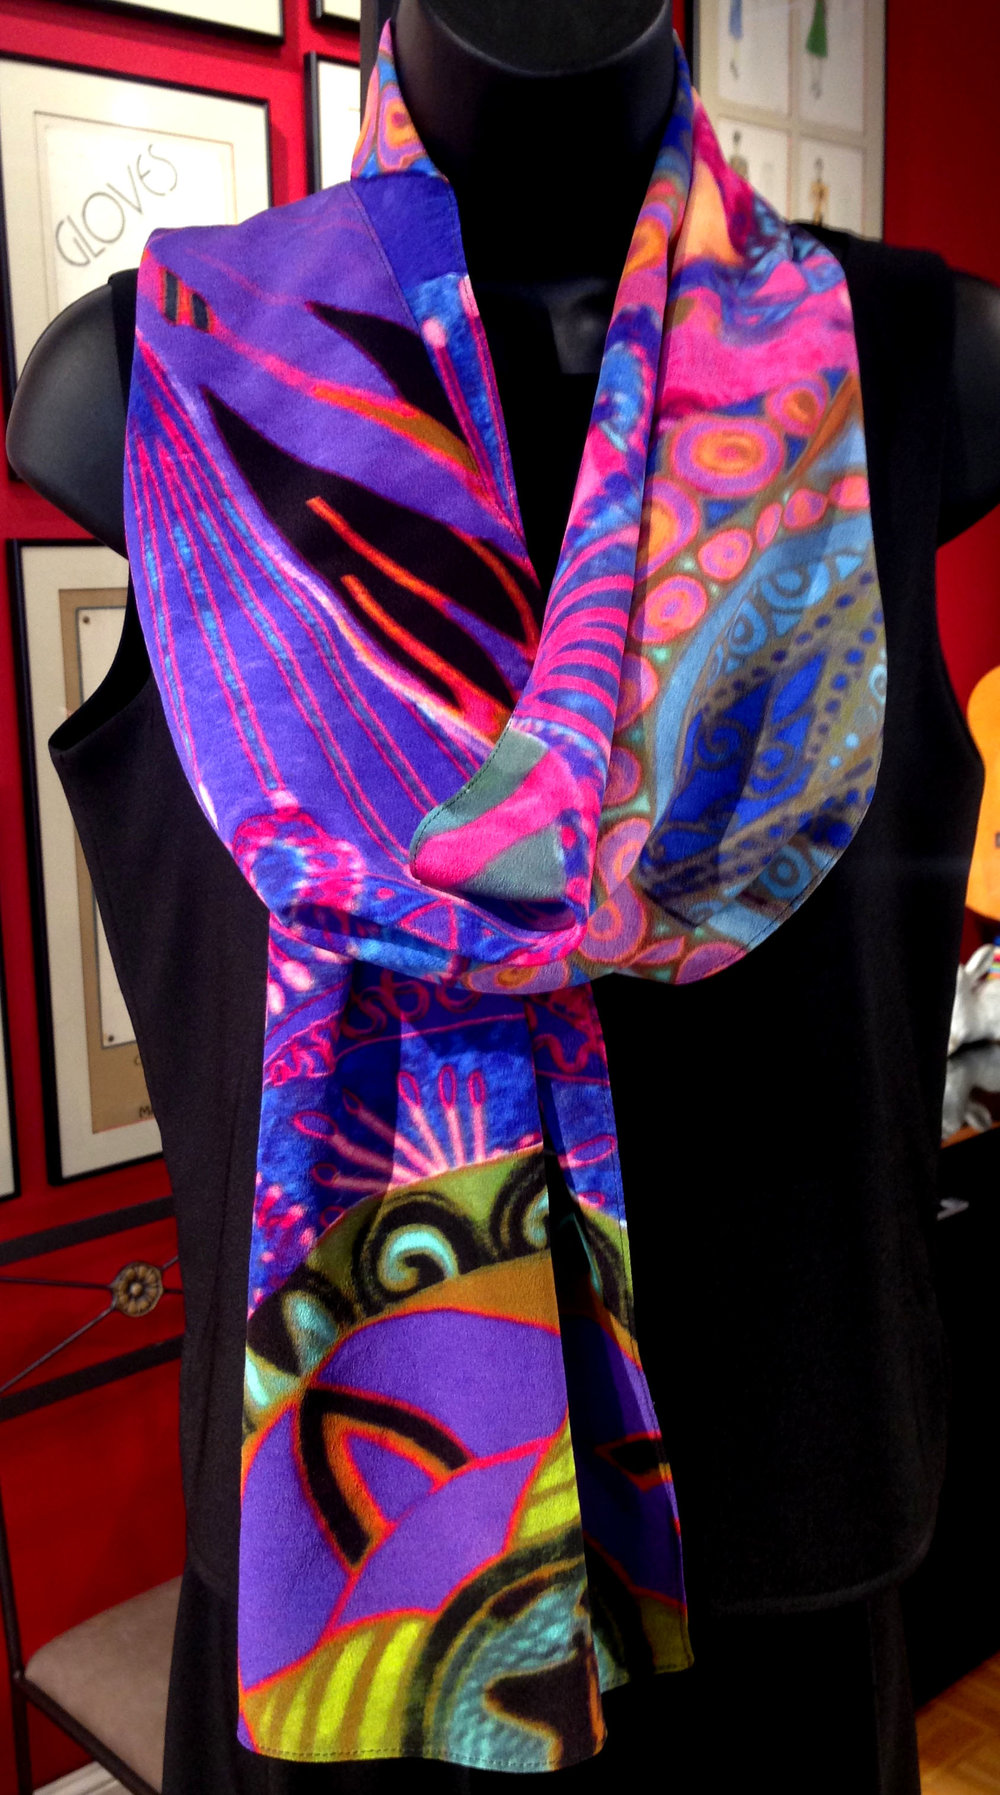 judi-magier-wearable-art-scarf-night-circus-bright.jpg